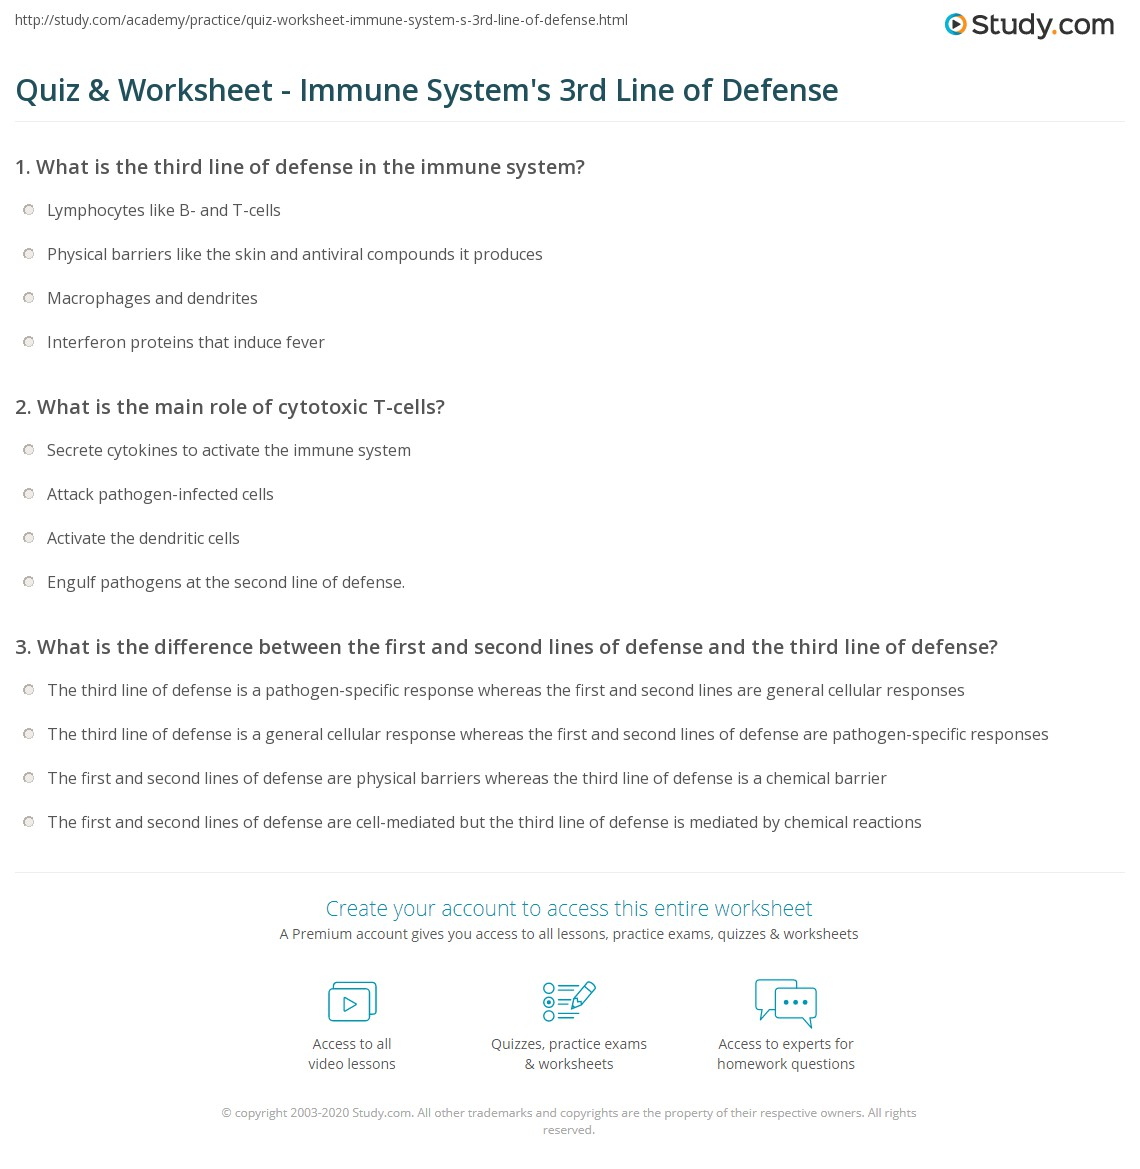 Quiz Worksheet Immune System S 3rd Line Of Defense Study Com